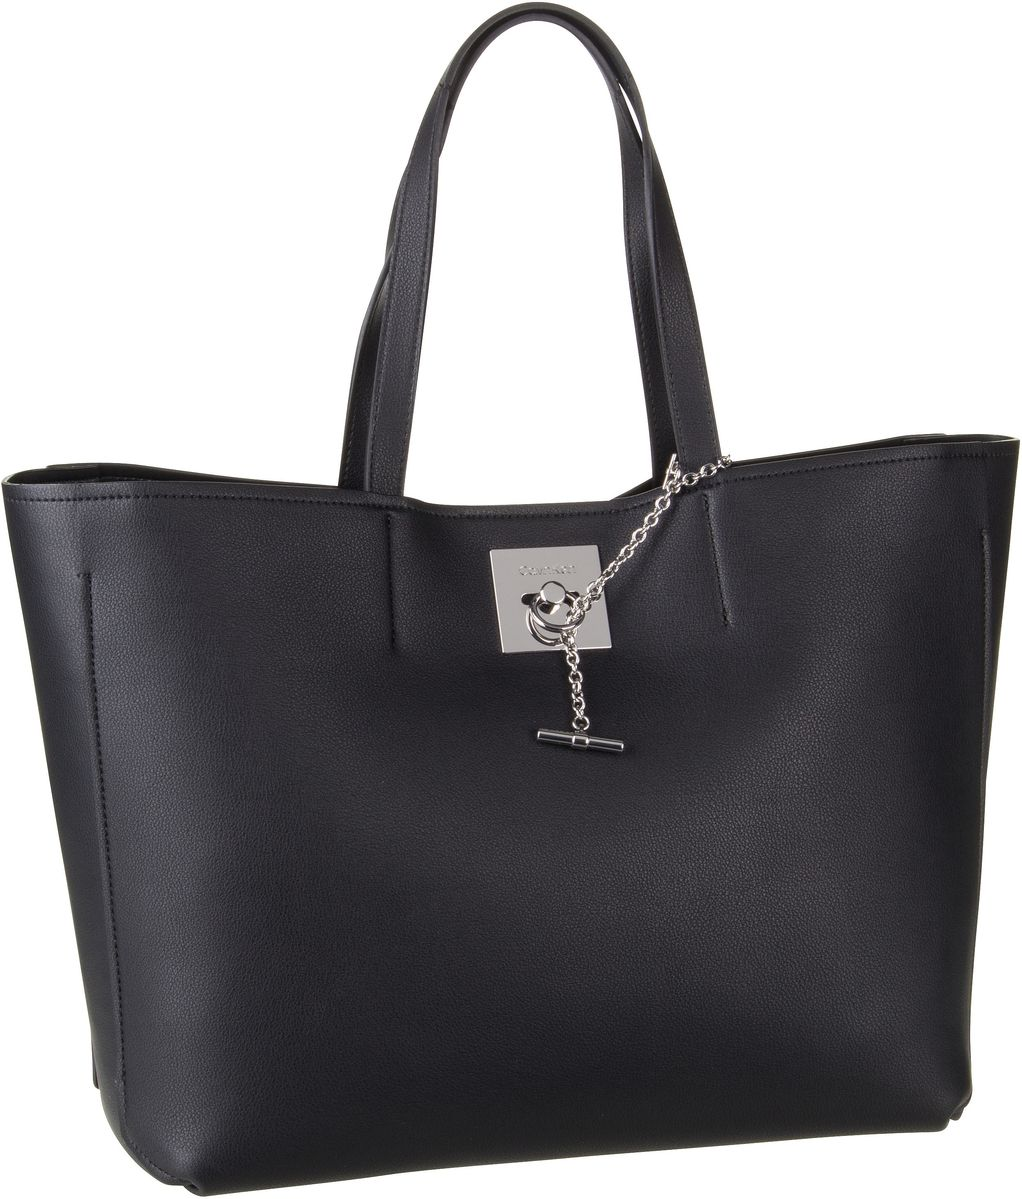 Handtasche CK Lock Shopper Black